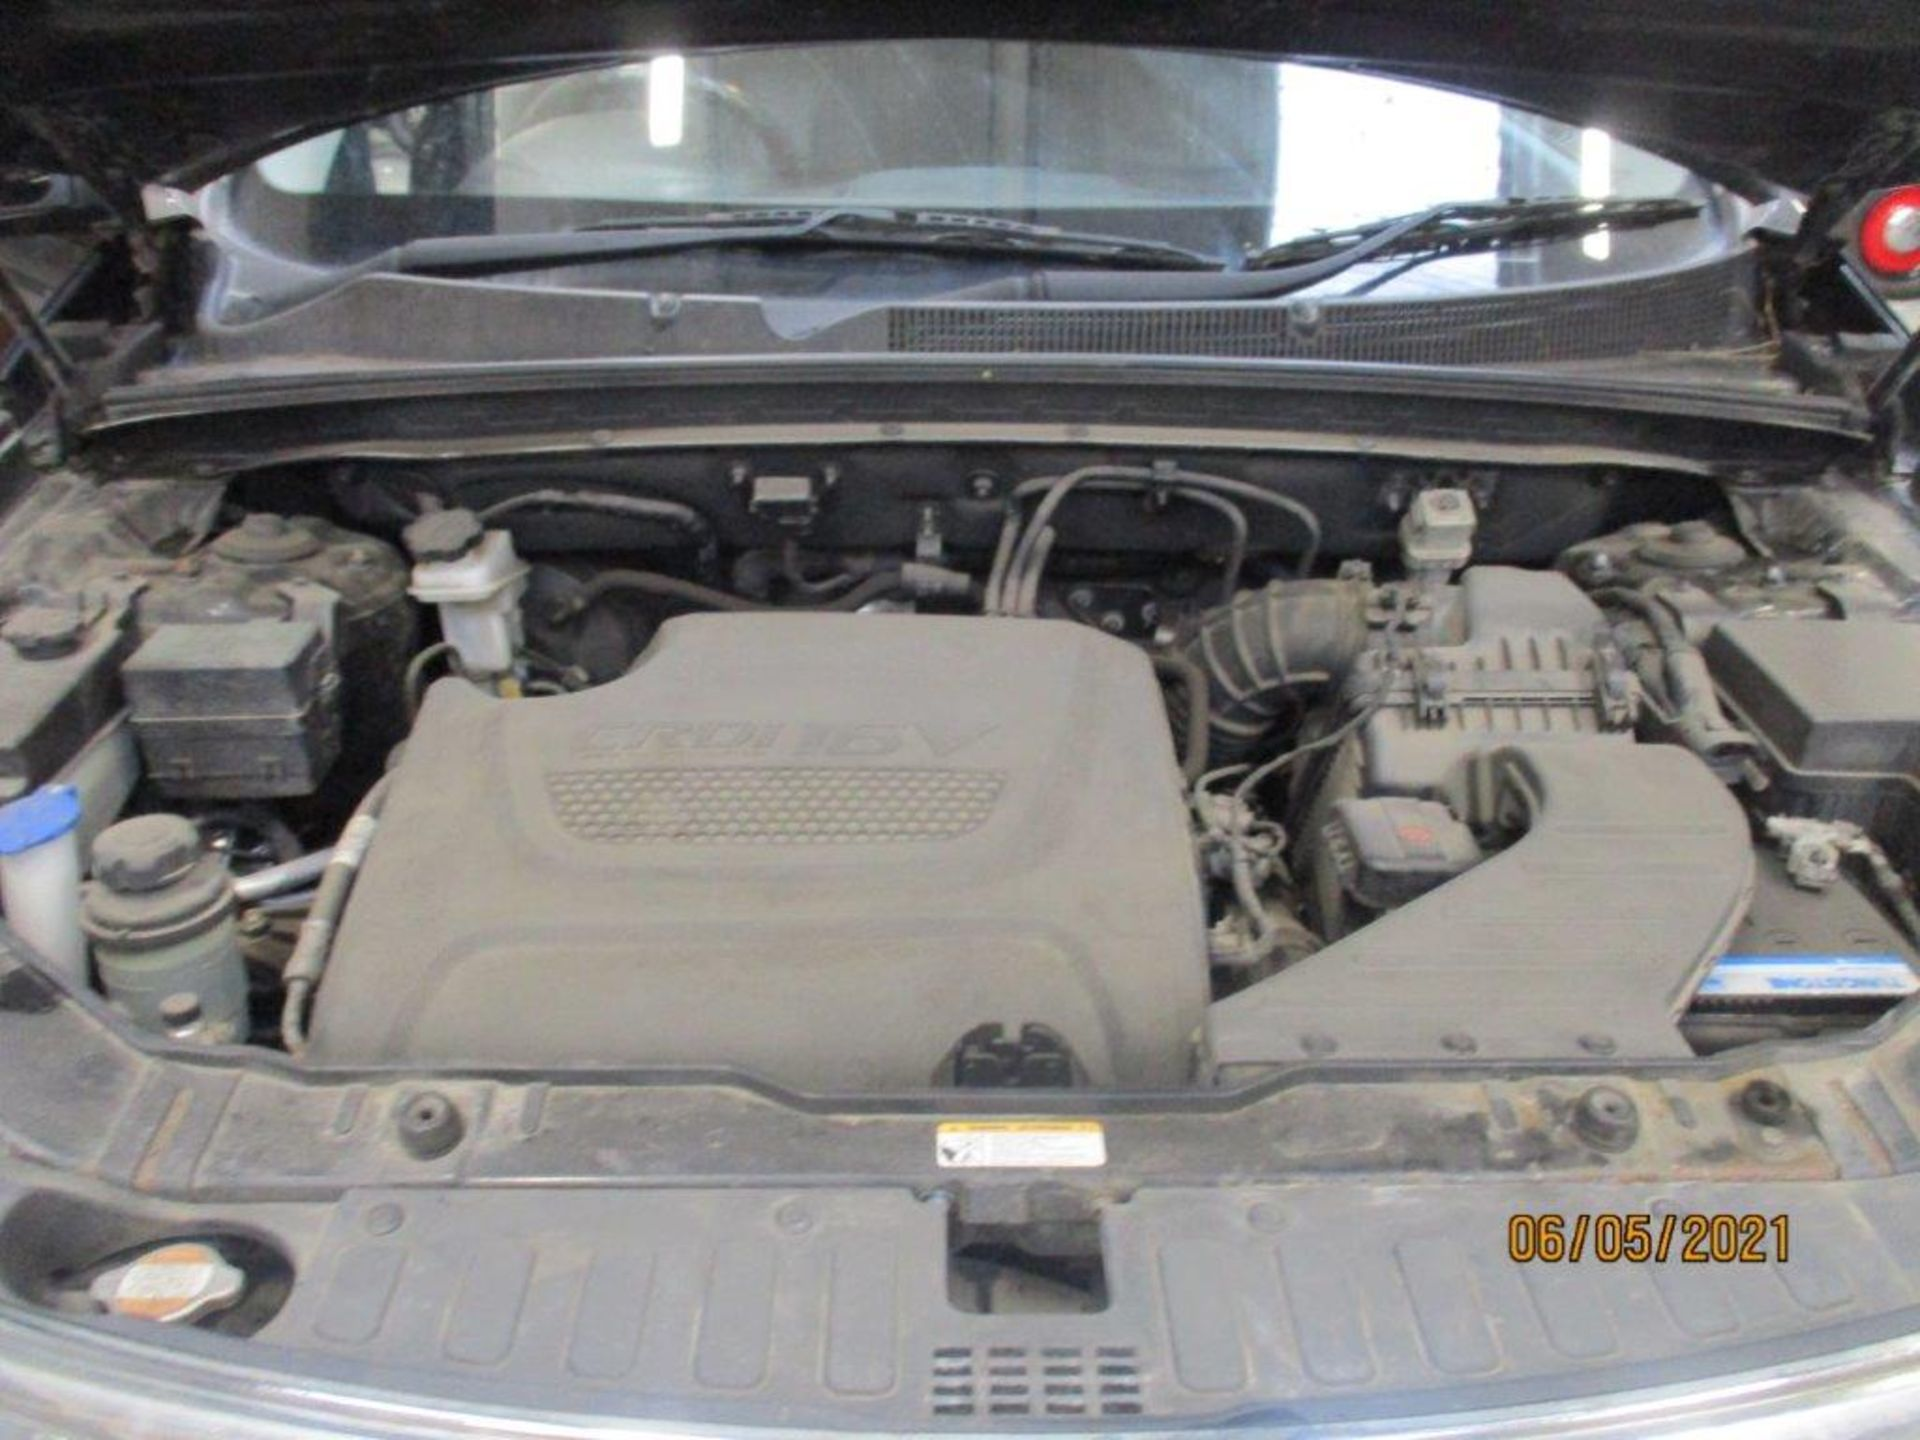 12 12 Kia Sorento KX2 CRDI Auto - Image 8 of 24